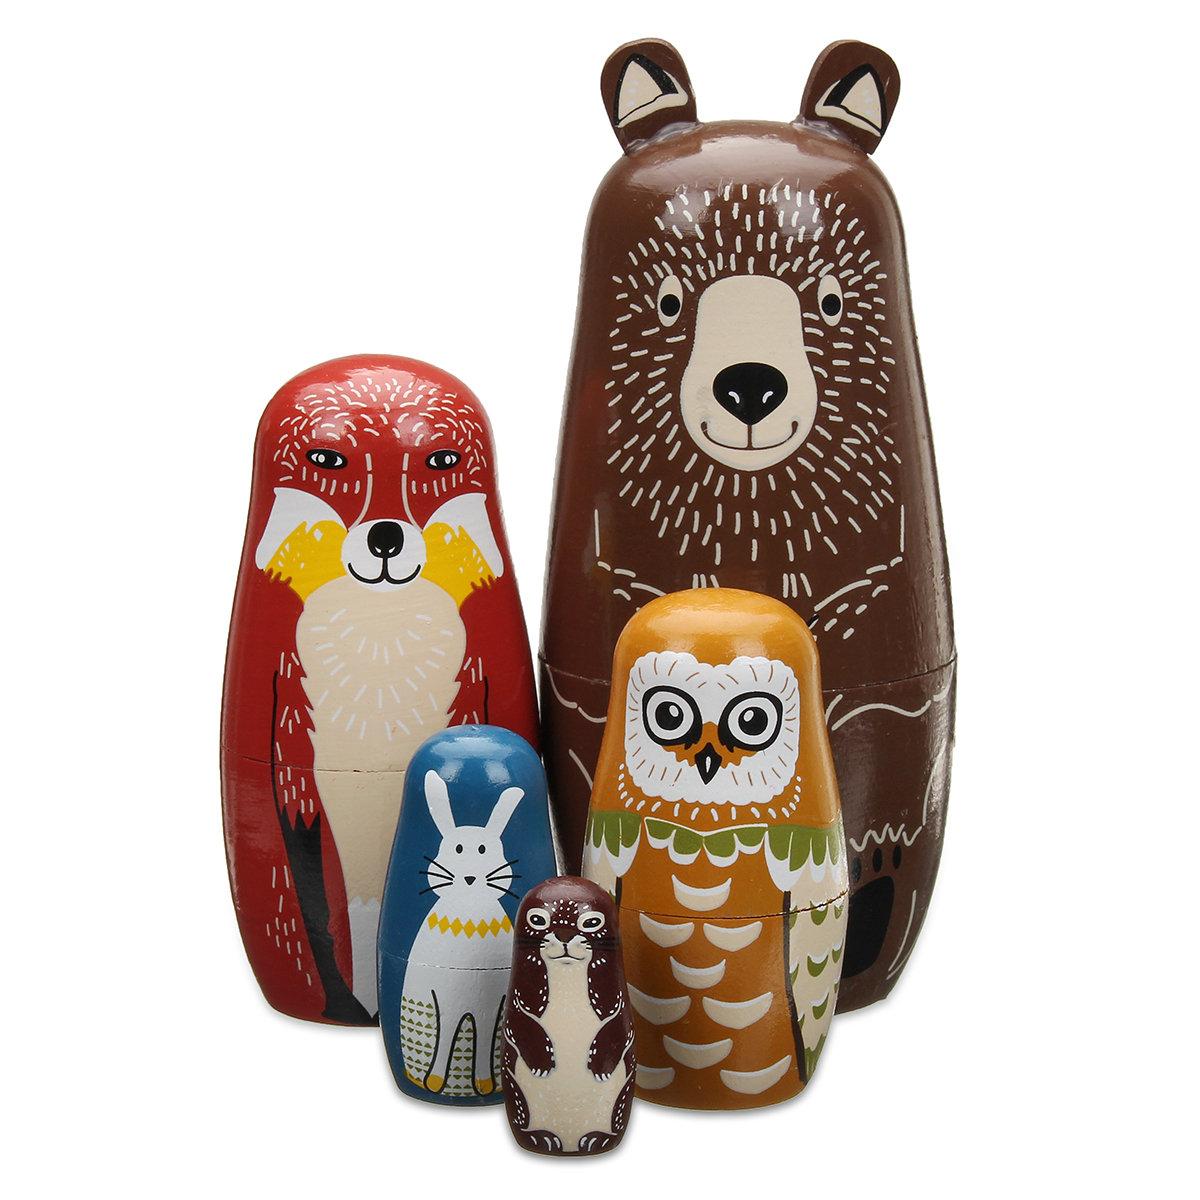 5 Nesting Dolls Wooden Animal Russian Doll Toy Decor Kid Gift